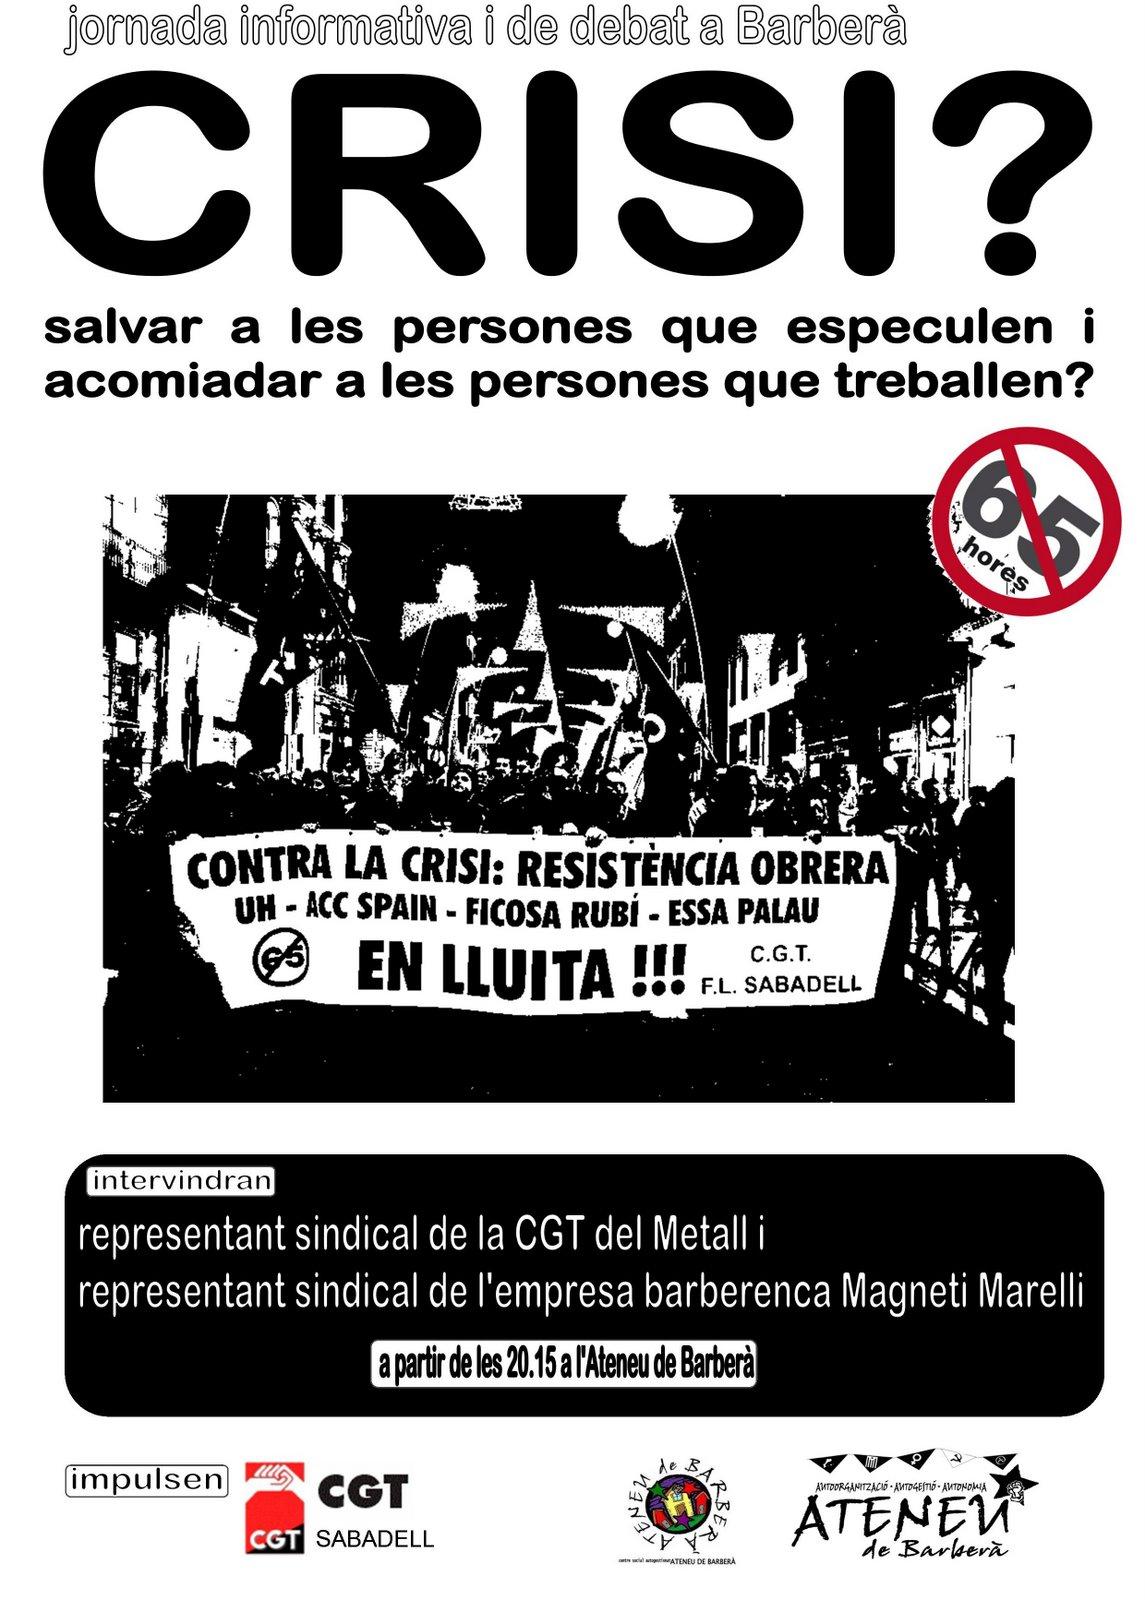 cartell xerrada crisi Barberà